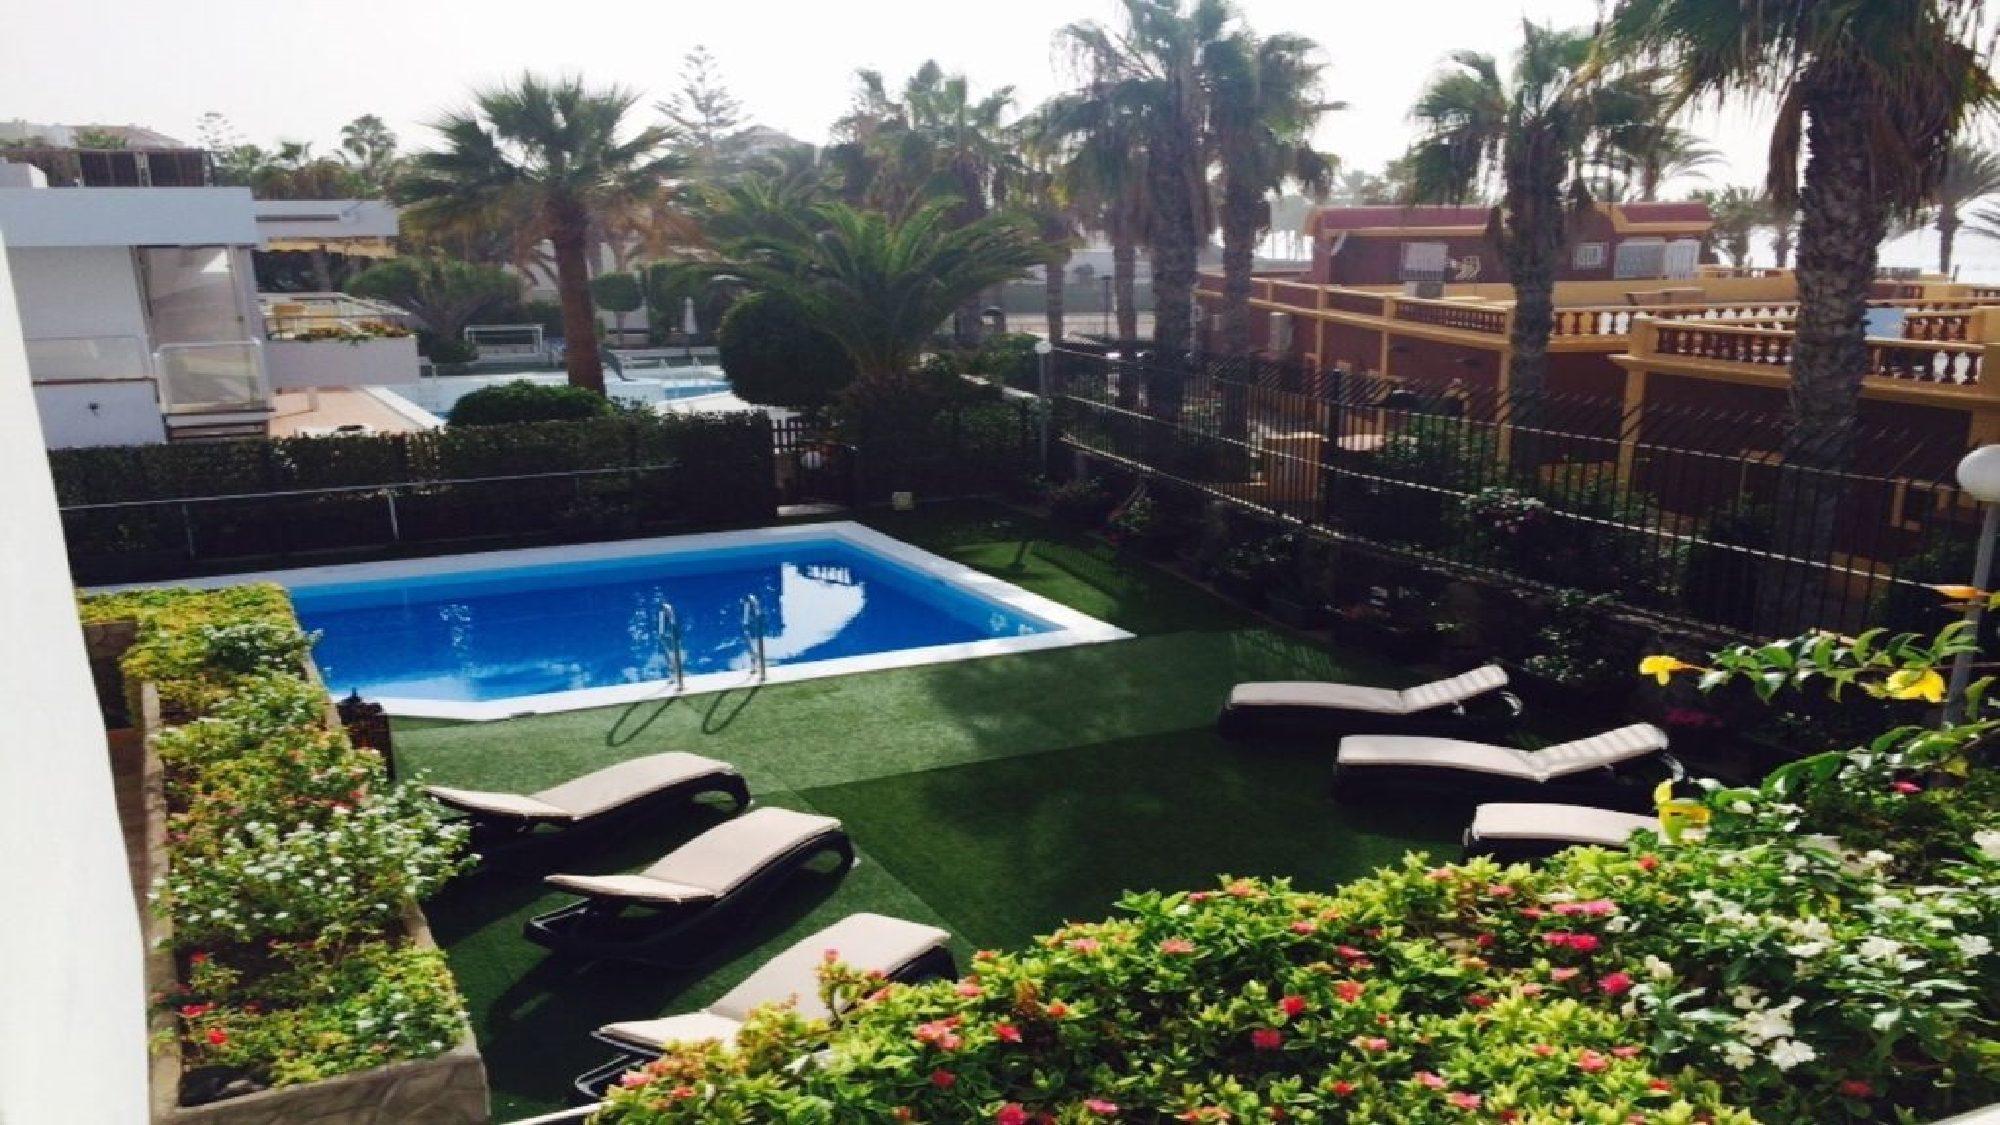 6 bedroom villa for rent in Tenerife private heated pool in las americas